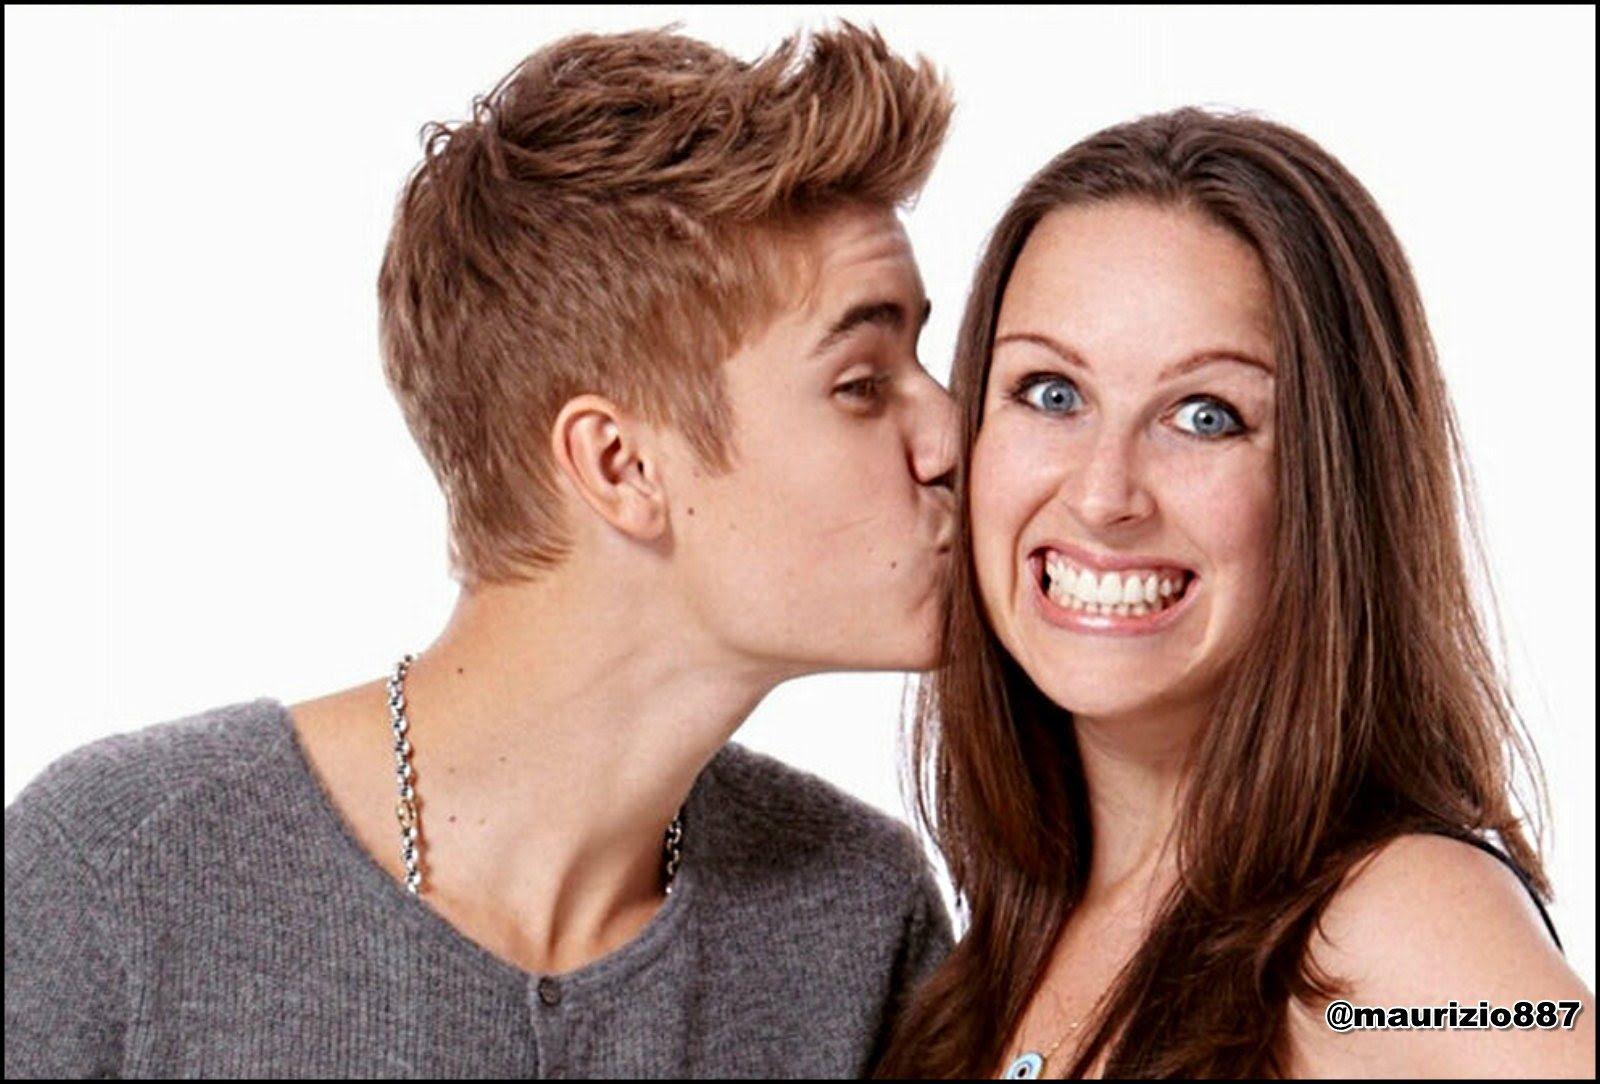 Justin Bieber Images Justin Biebermagazines Photoshoot 2013 Hd